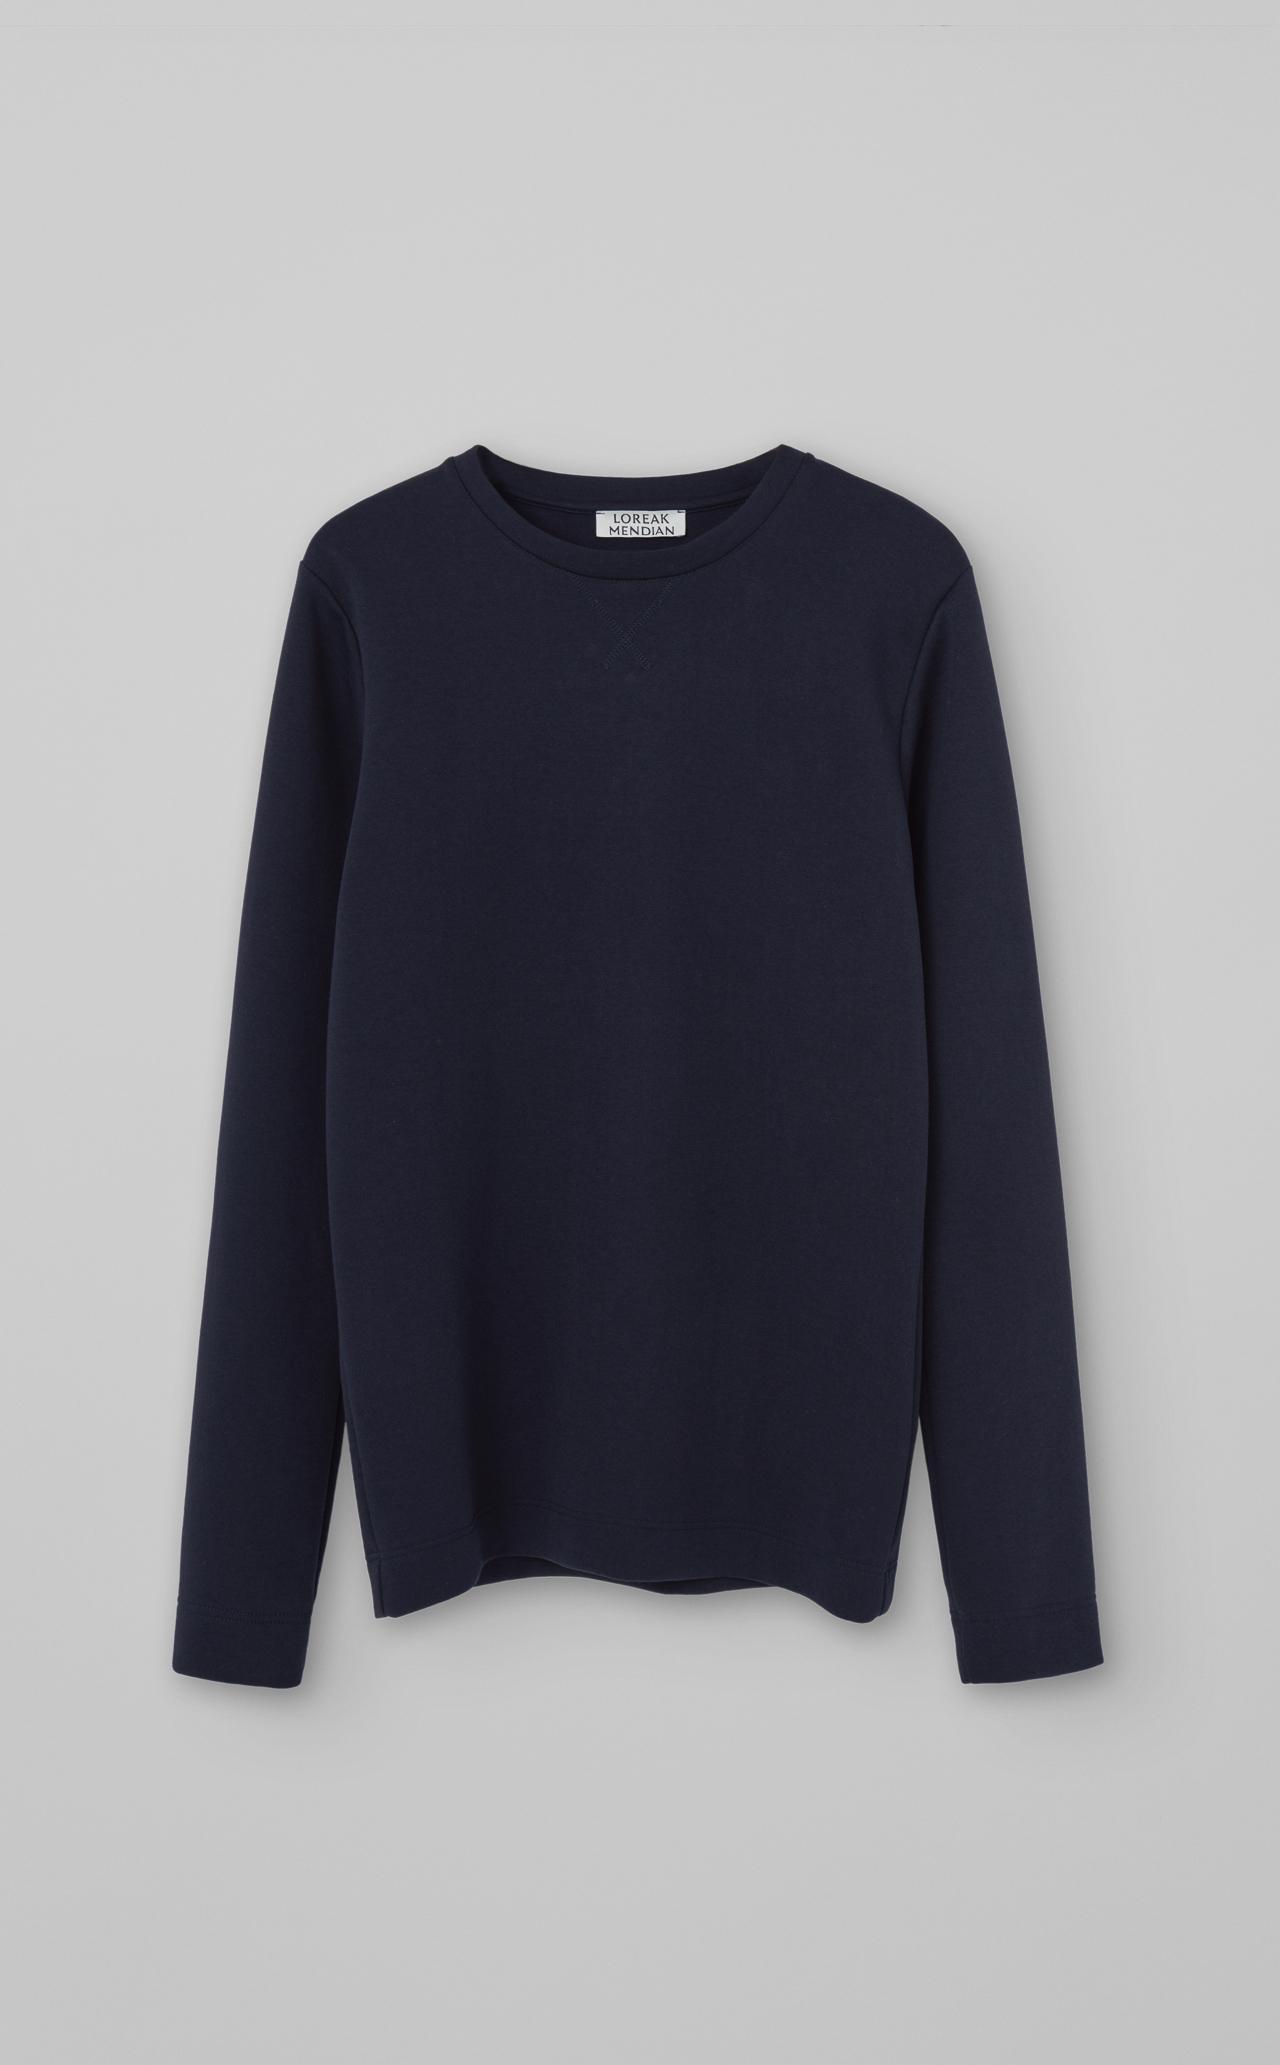 Garnett Sweatshirt